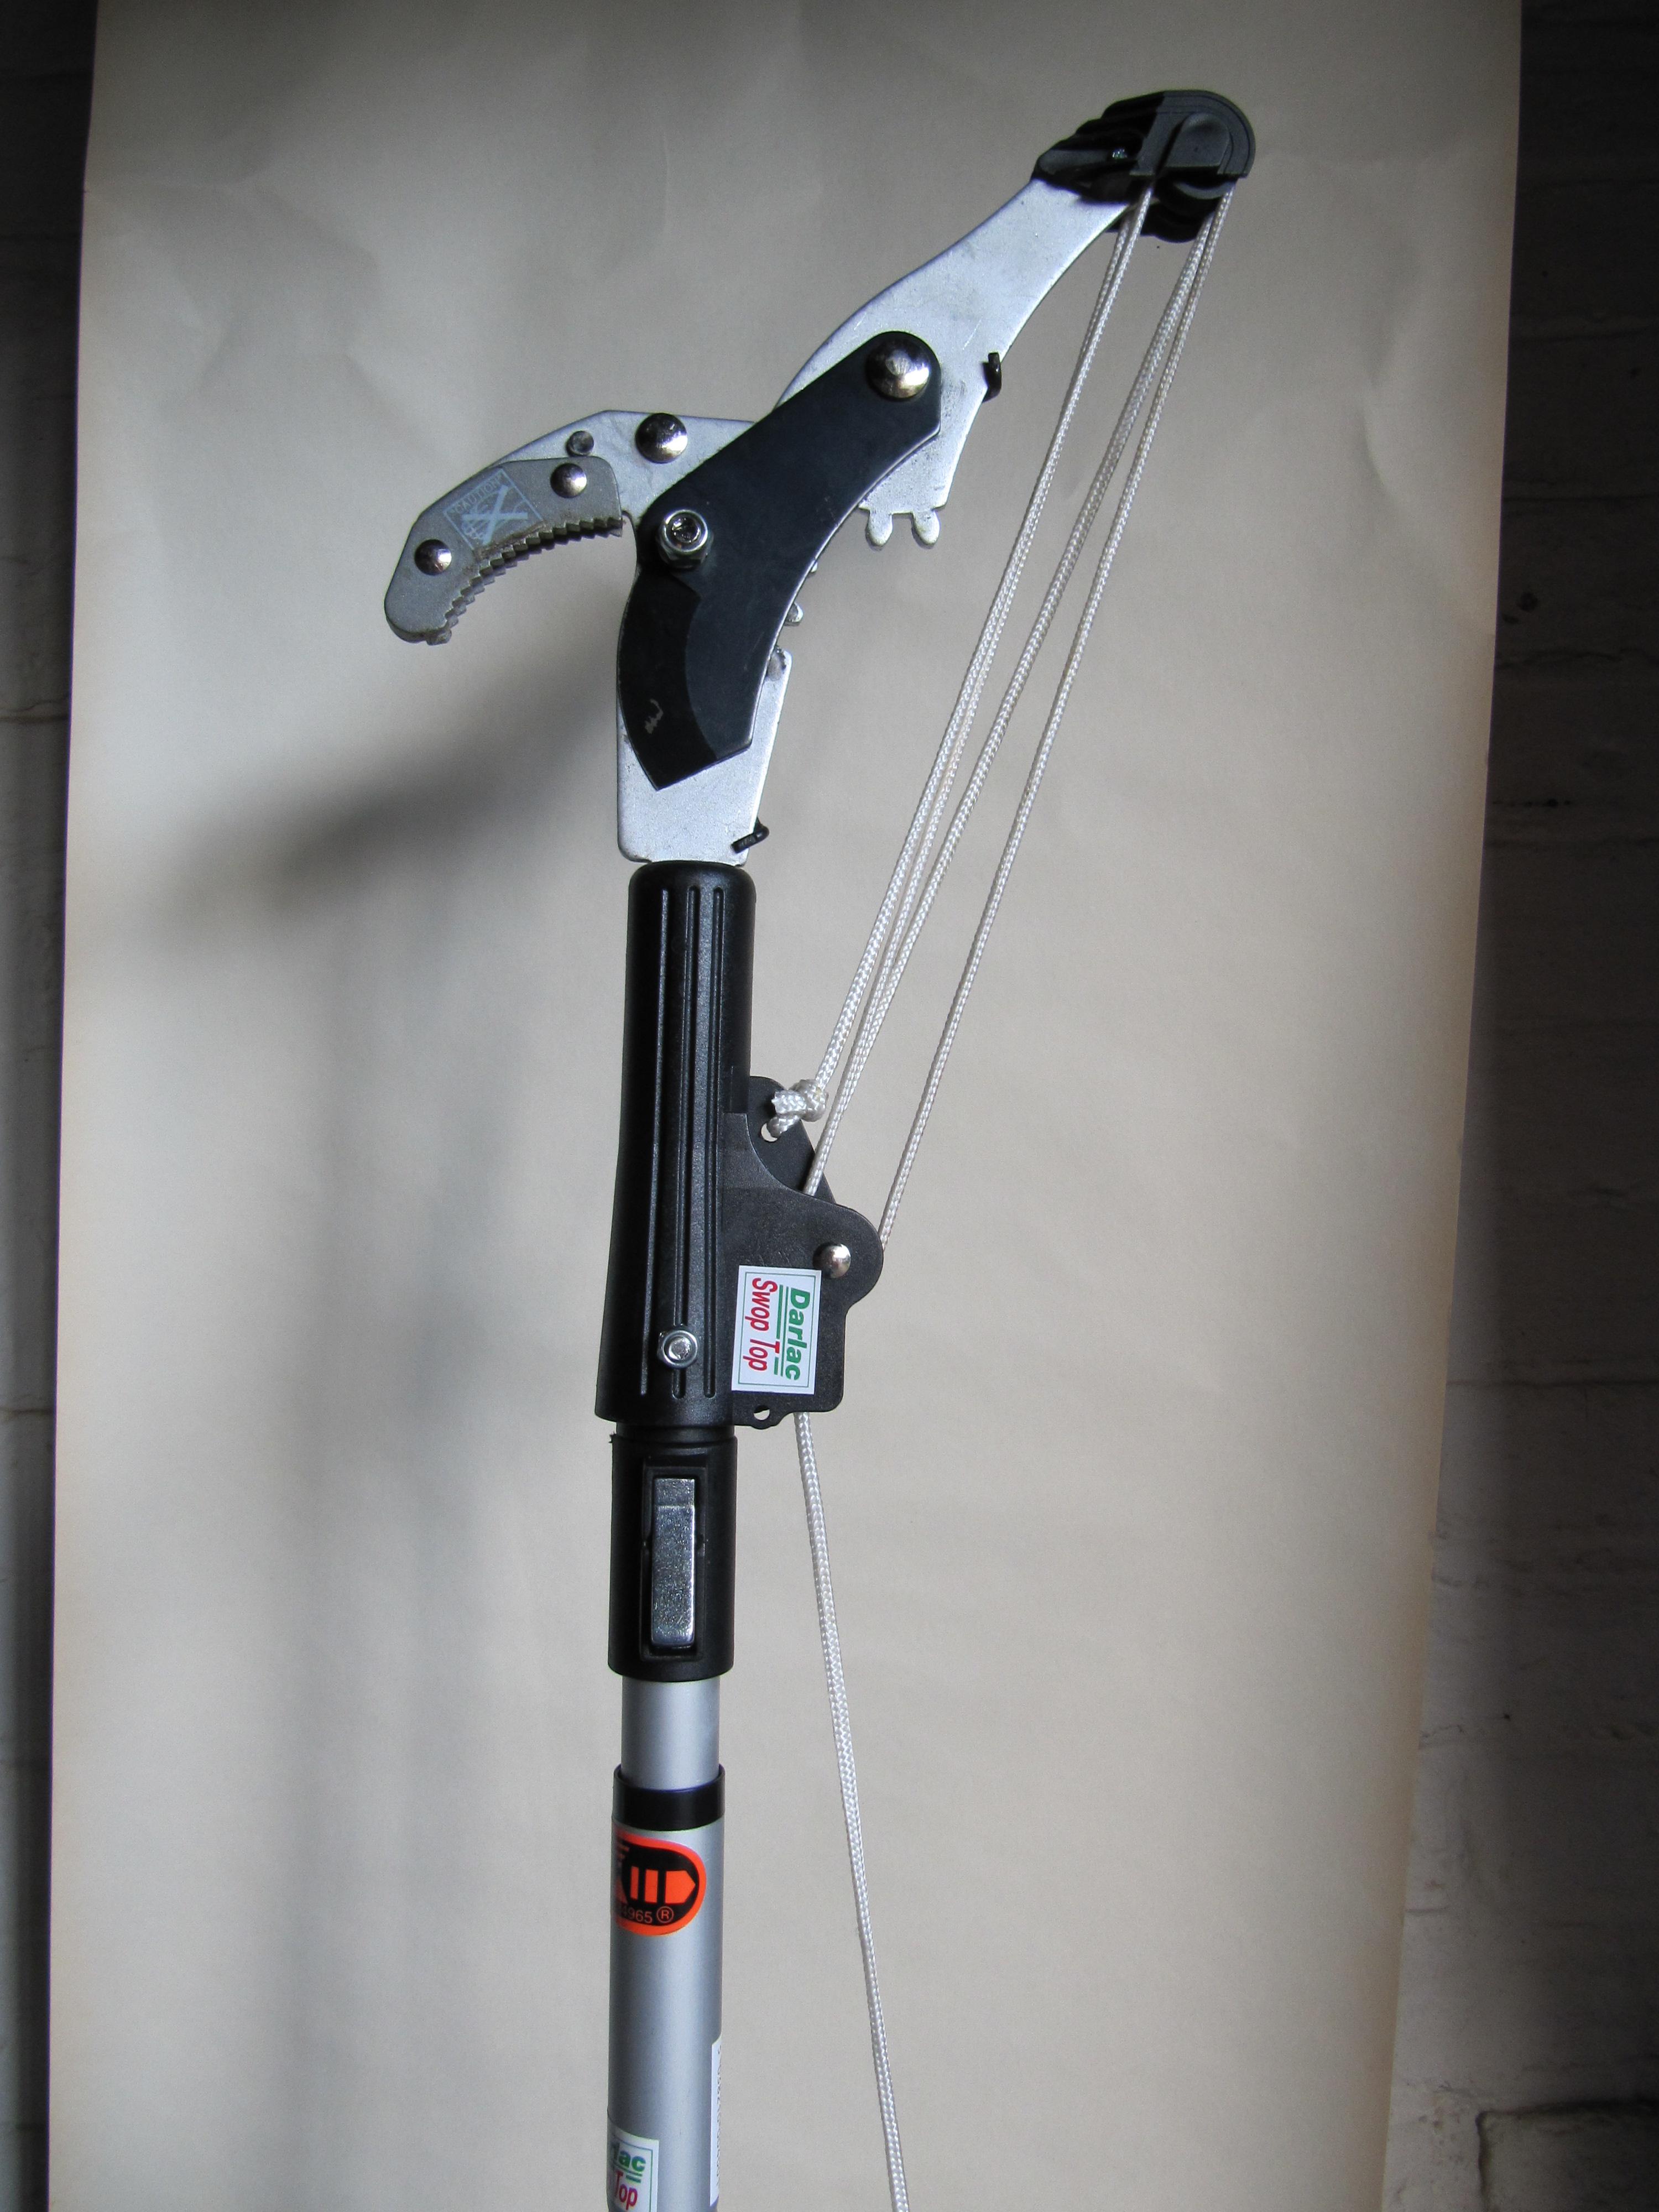 DIY small quadcopter drone Alien 480 folding frame 25mm